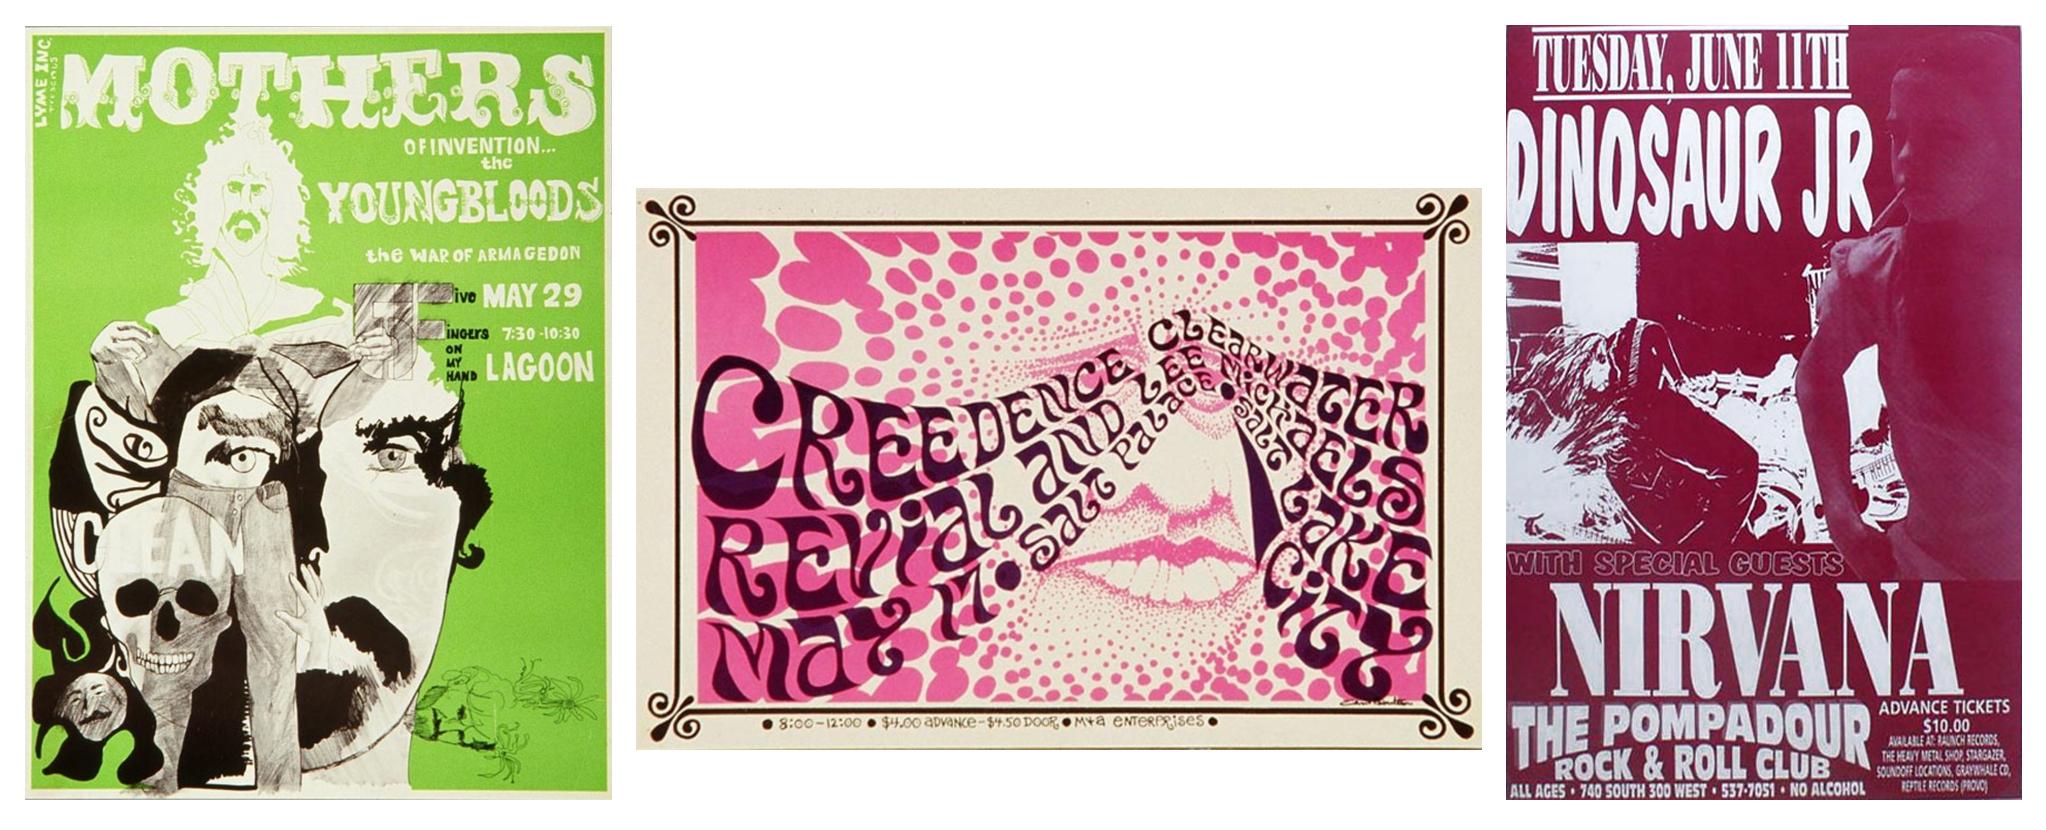 "Salt Lake City 11 x 14/"" Photo Print Led Zeppelin Concert Poster"